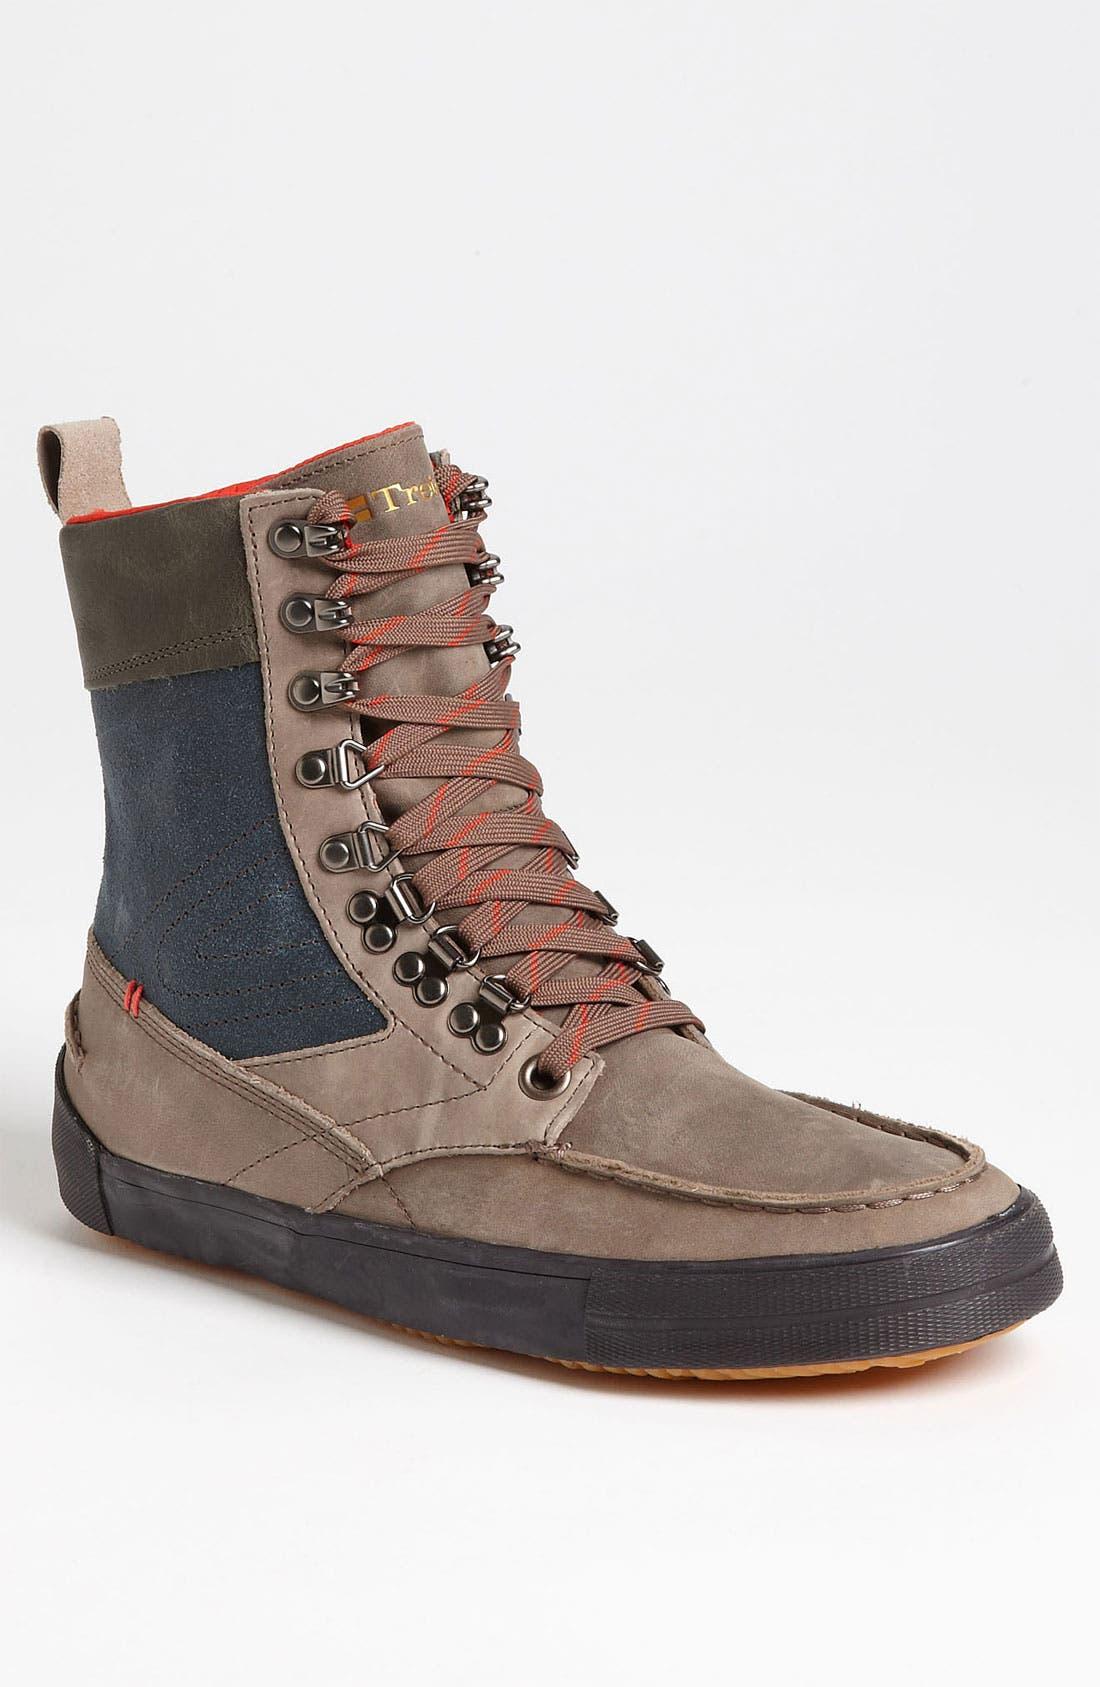 Main Image - Tretorn 'Highlander' High Top Sneaker